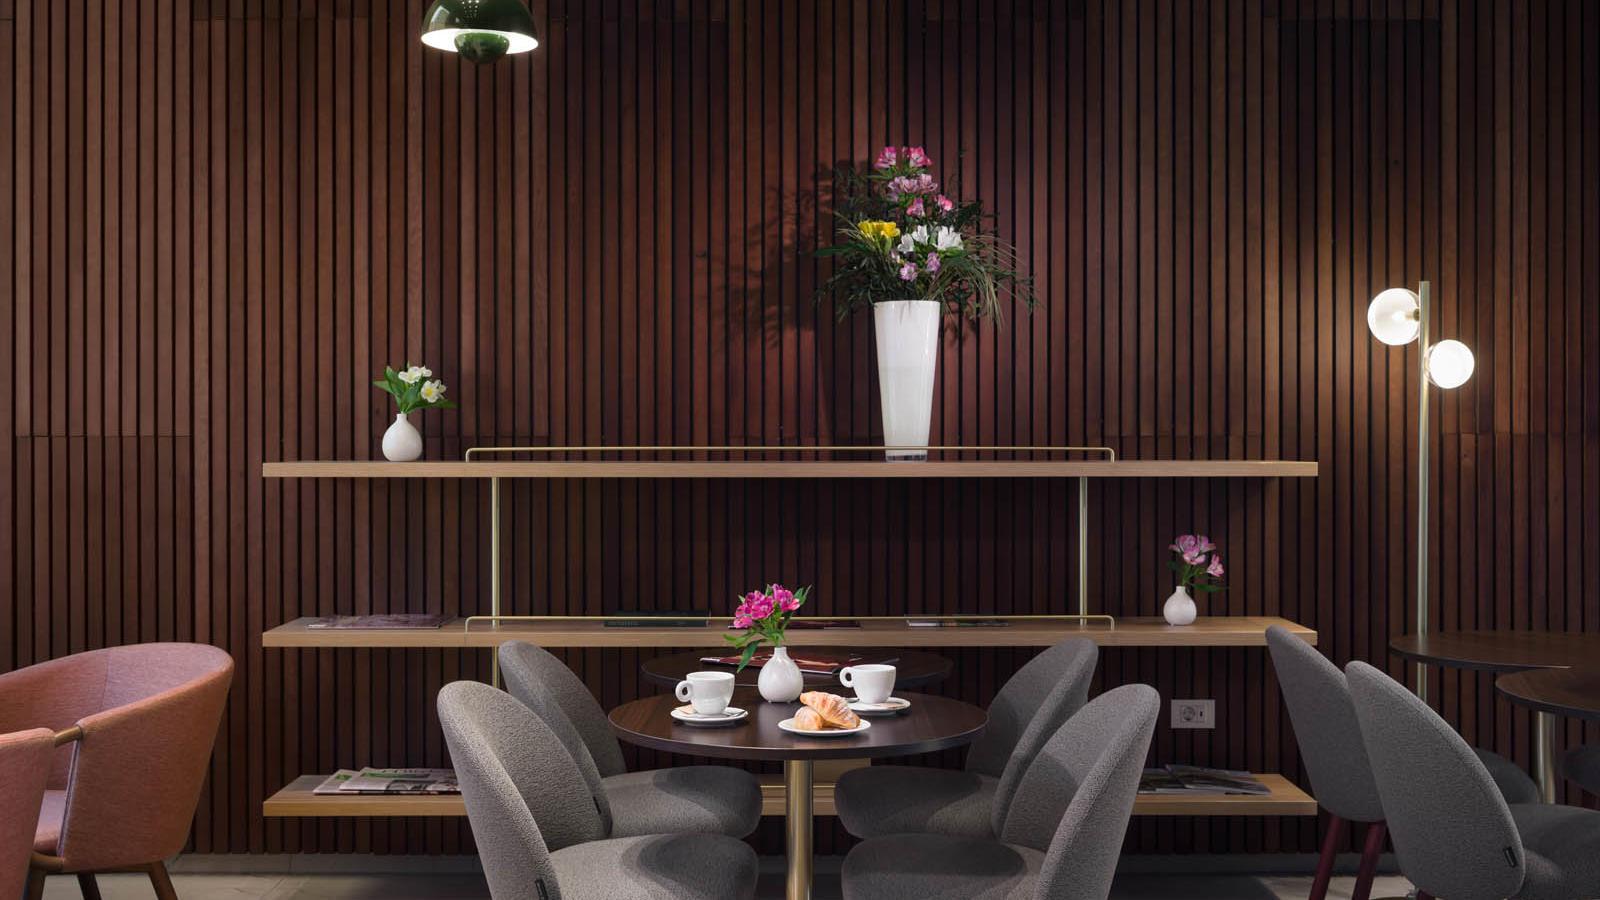 L Bistro & Bar interior 4